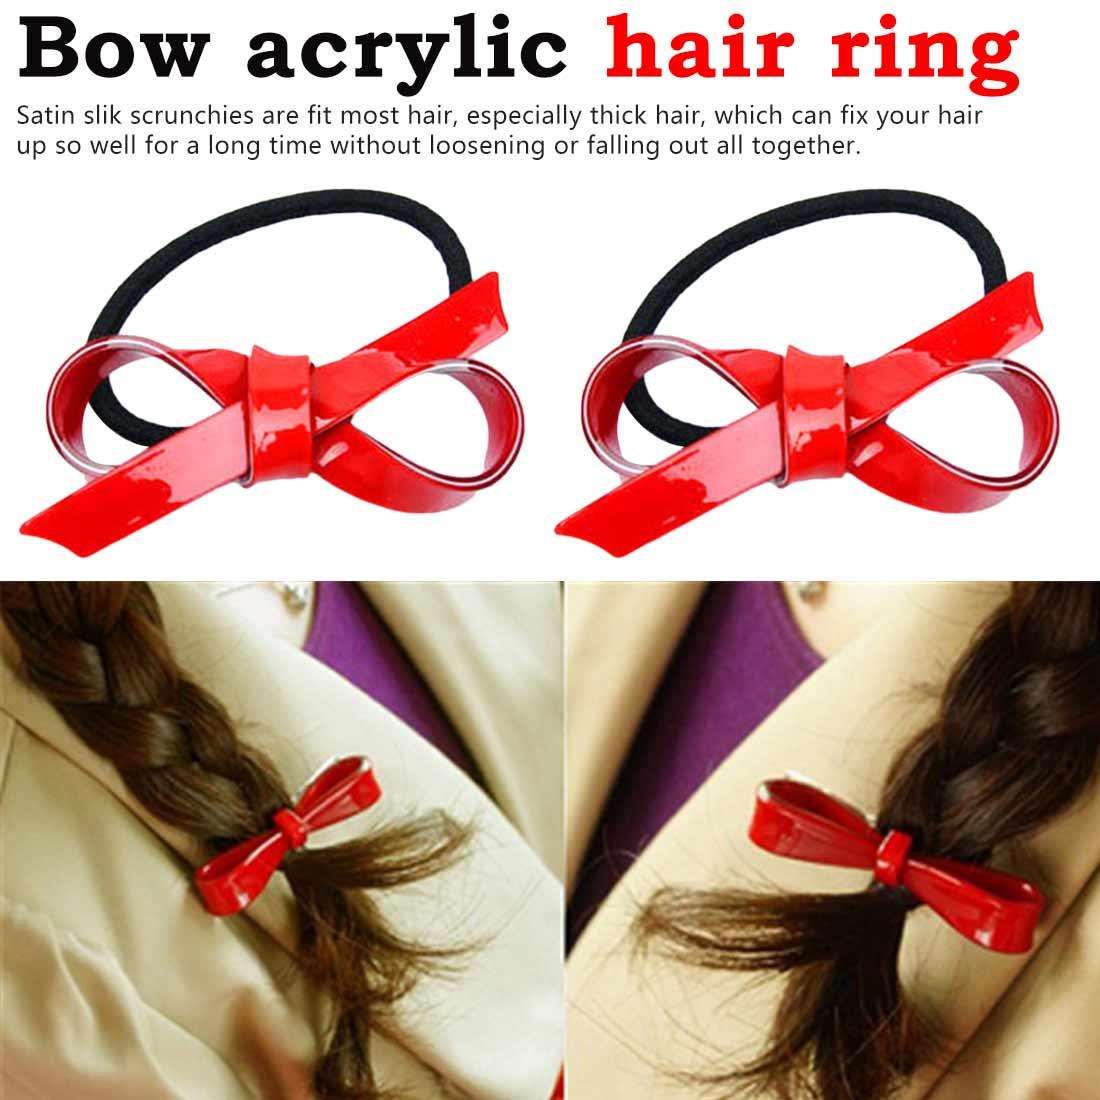 Bow Acrylic Hair Clips Joker Side Clip Hairpin Head Ornament Hair Strap Red Elastic Hair Band Ponytail Clip Bow Hair Ribbons